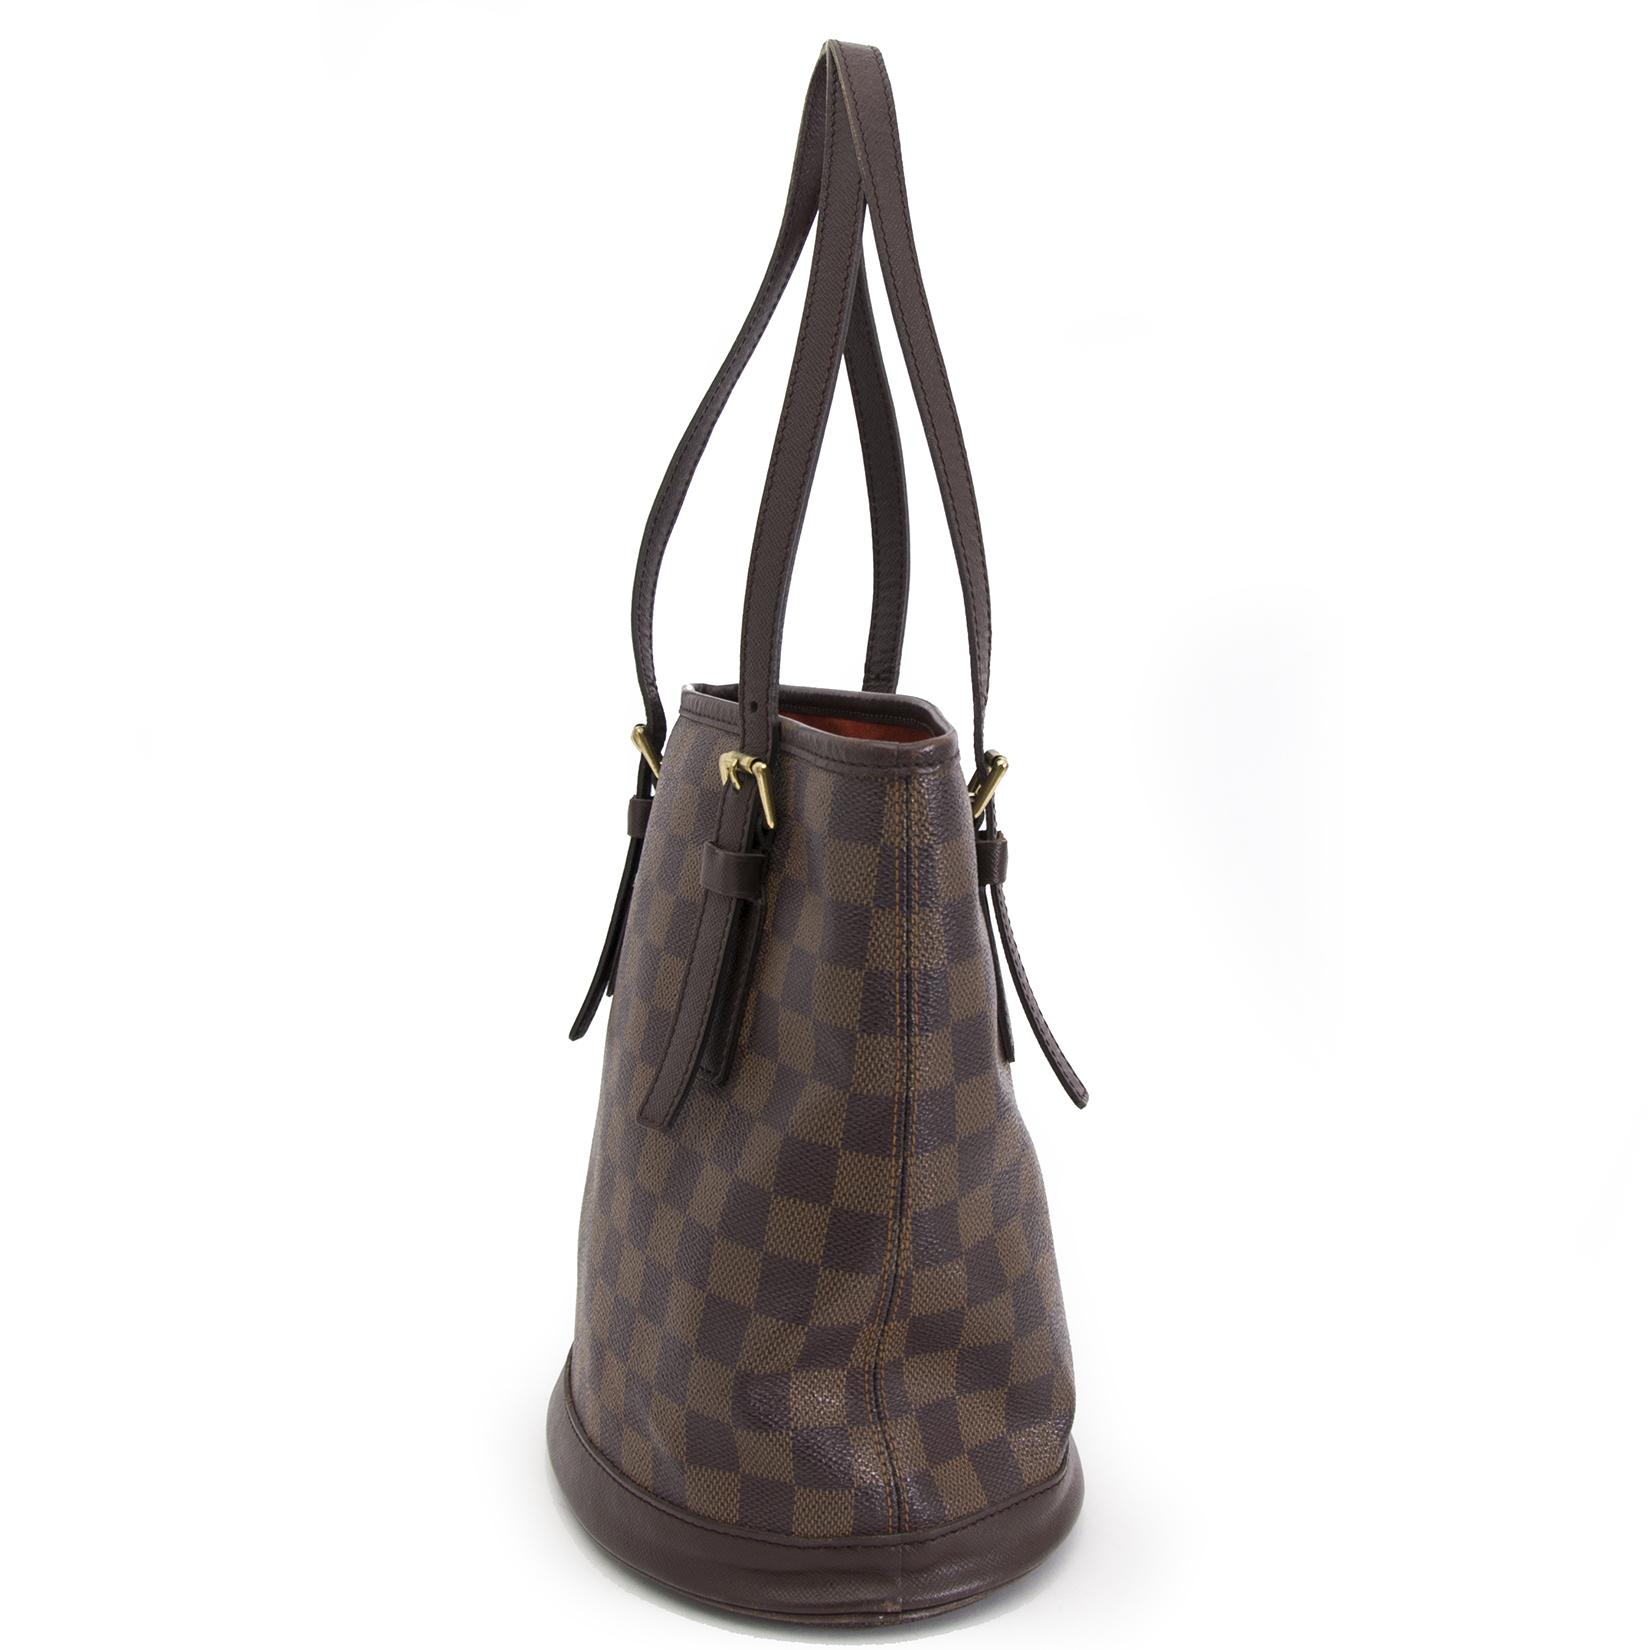 looking for a secondhand Louis Vuitton Damier Ebene Marais Bucket Bag PM